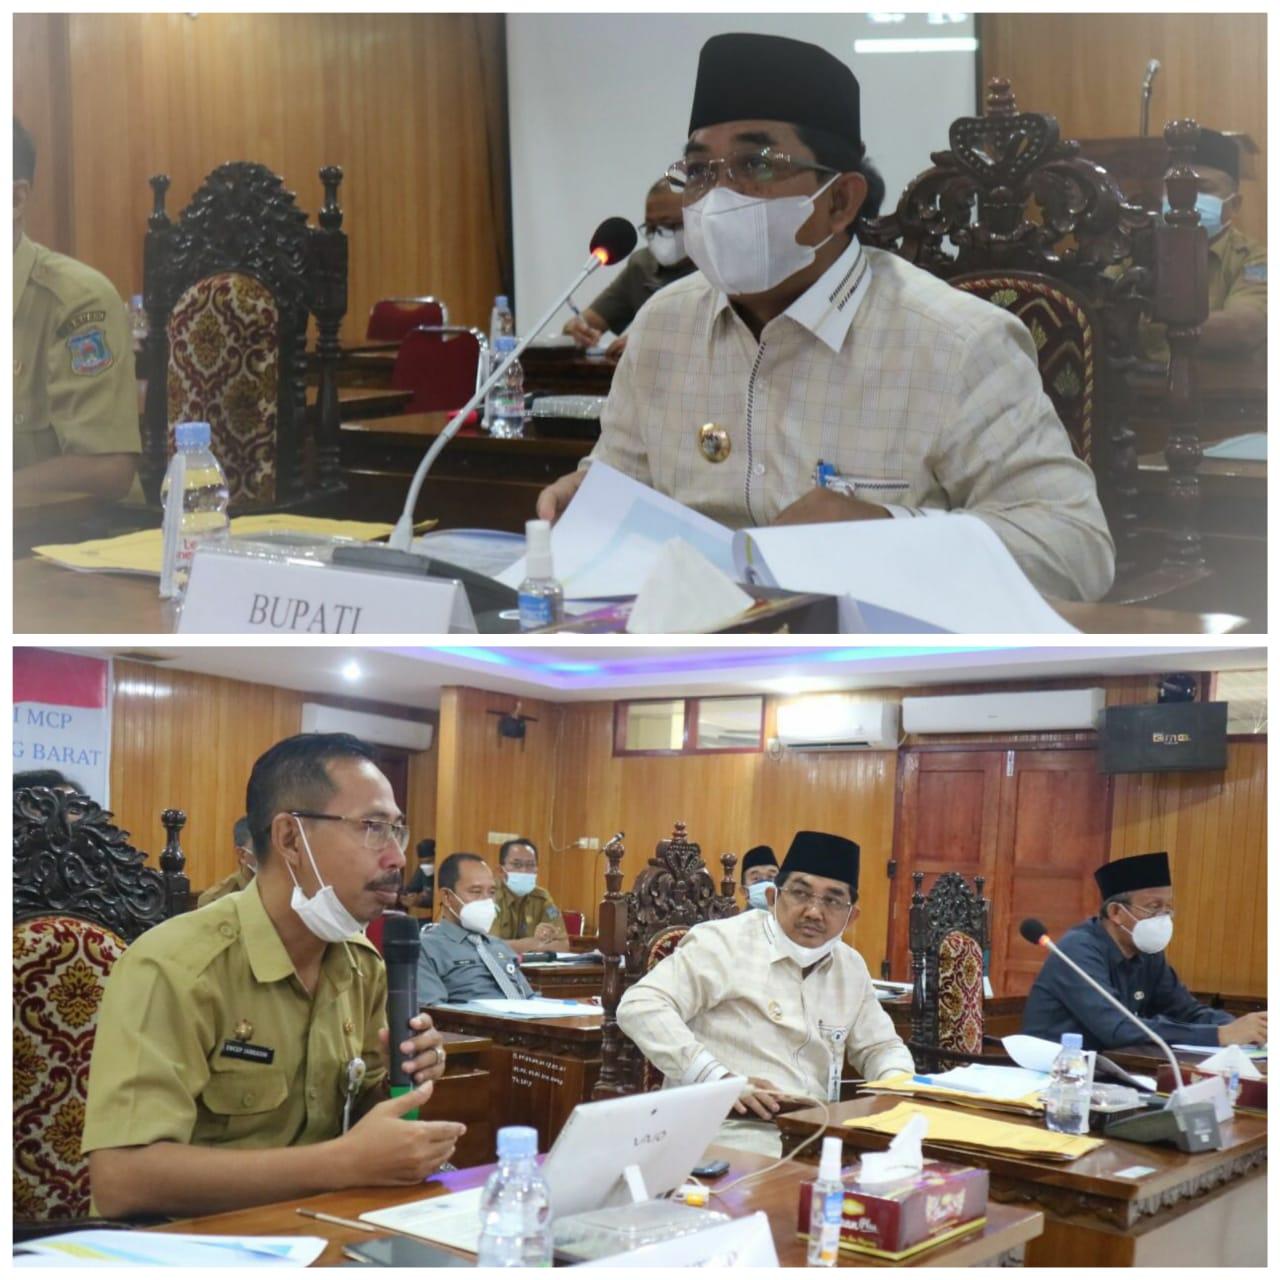 Bupati Tanjab Barat Buka Rapat Video Confrence Monitoring dan Evaluasi Progres MCP